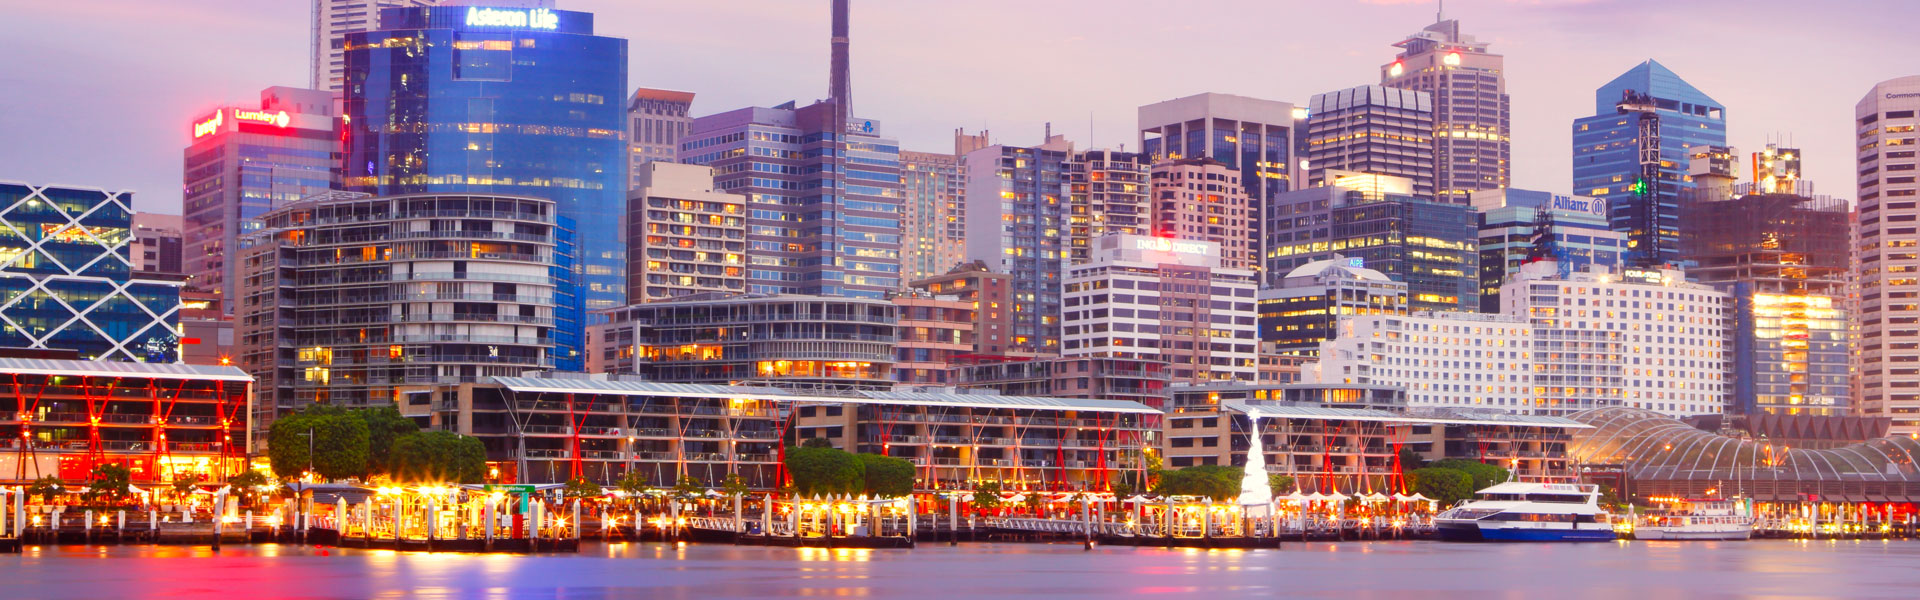 Sunset in Darling Harbour in Sydney